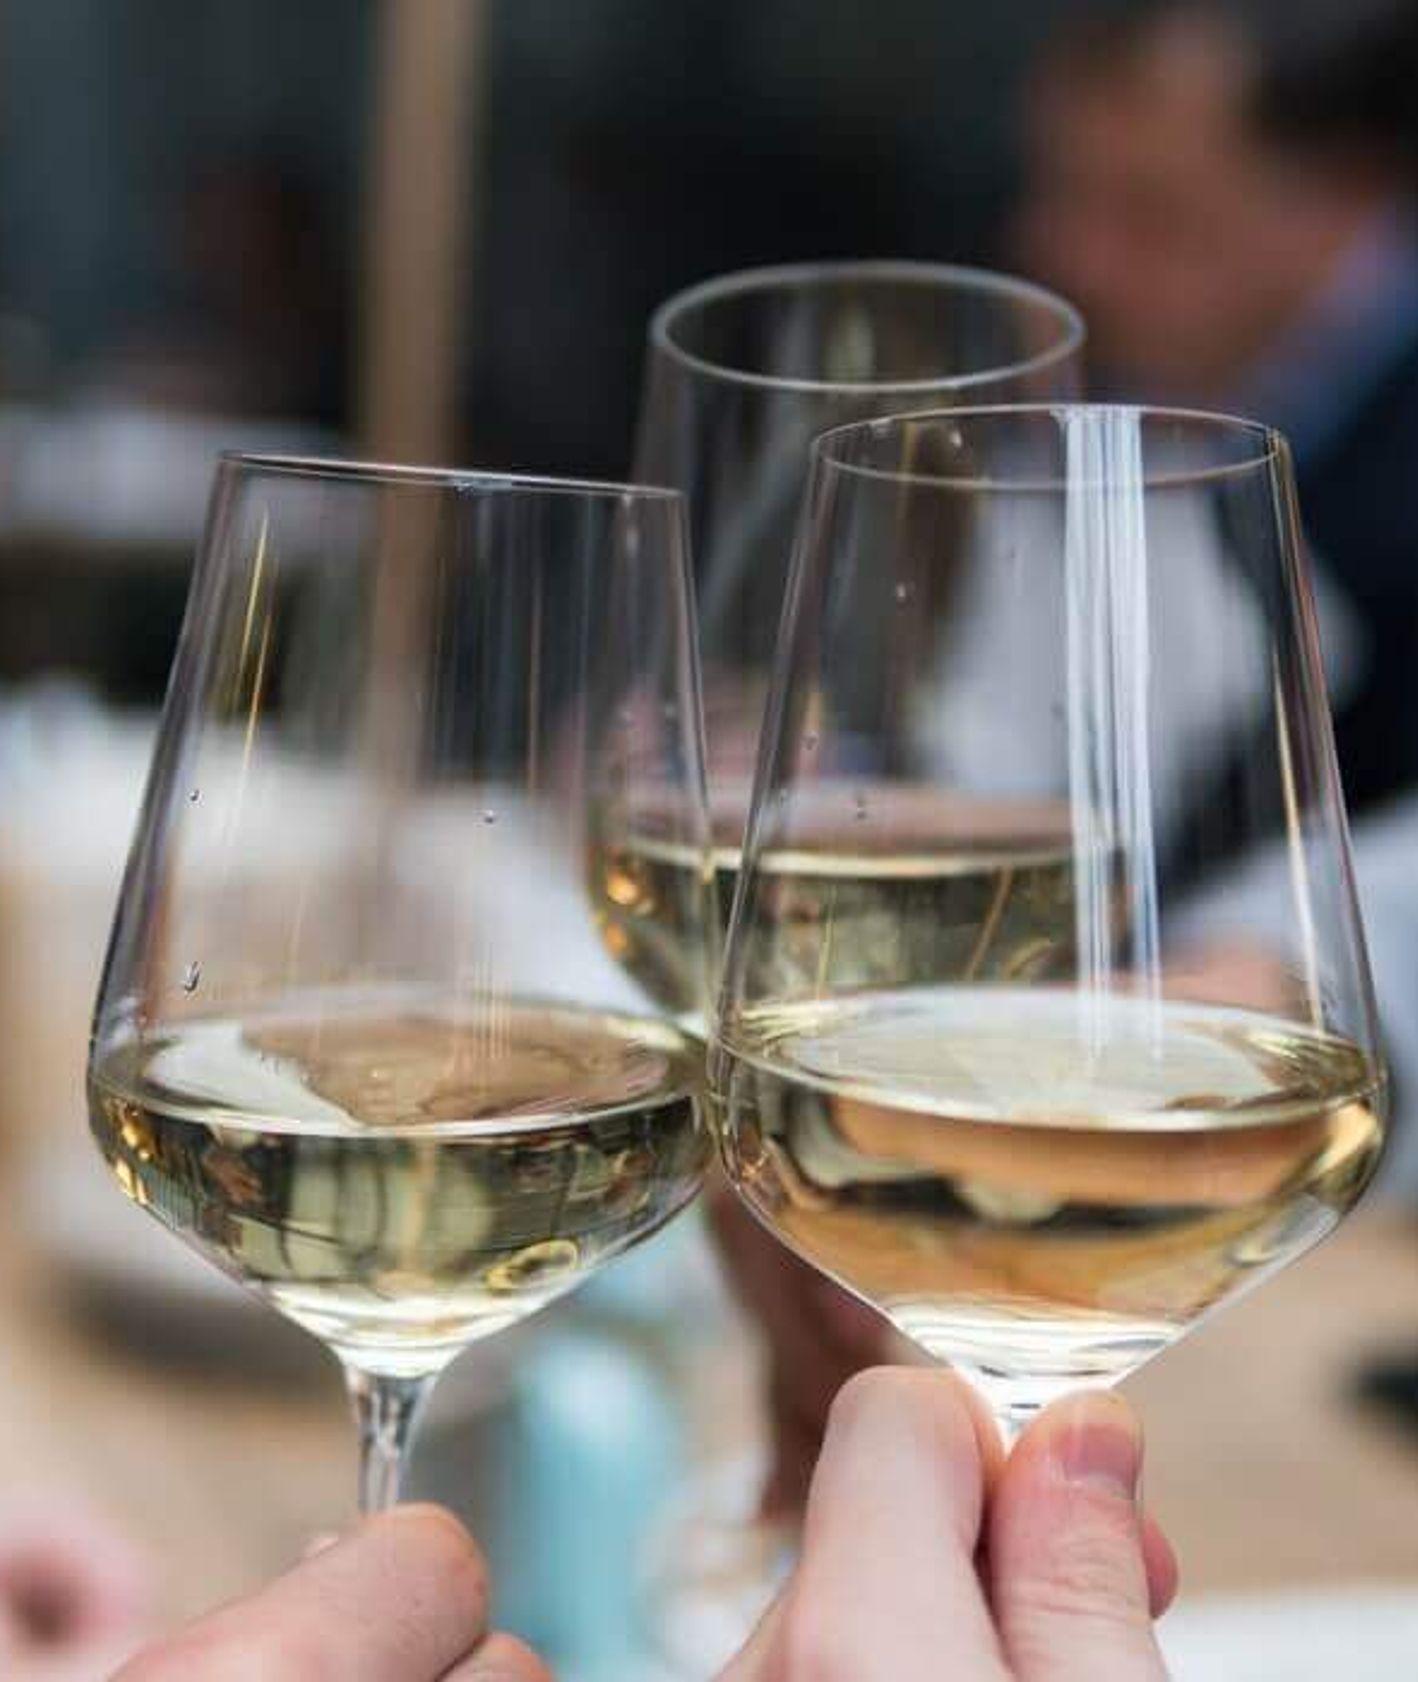 białe wino, jak wybrać wino, wino musujące, kukbuk radzi, jakie wino wybrać, prosecco, cava (fot. Matthieu Joannon / unsplash.com)